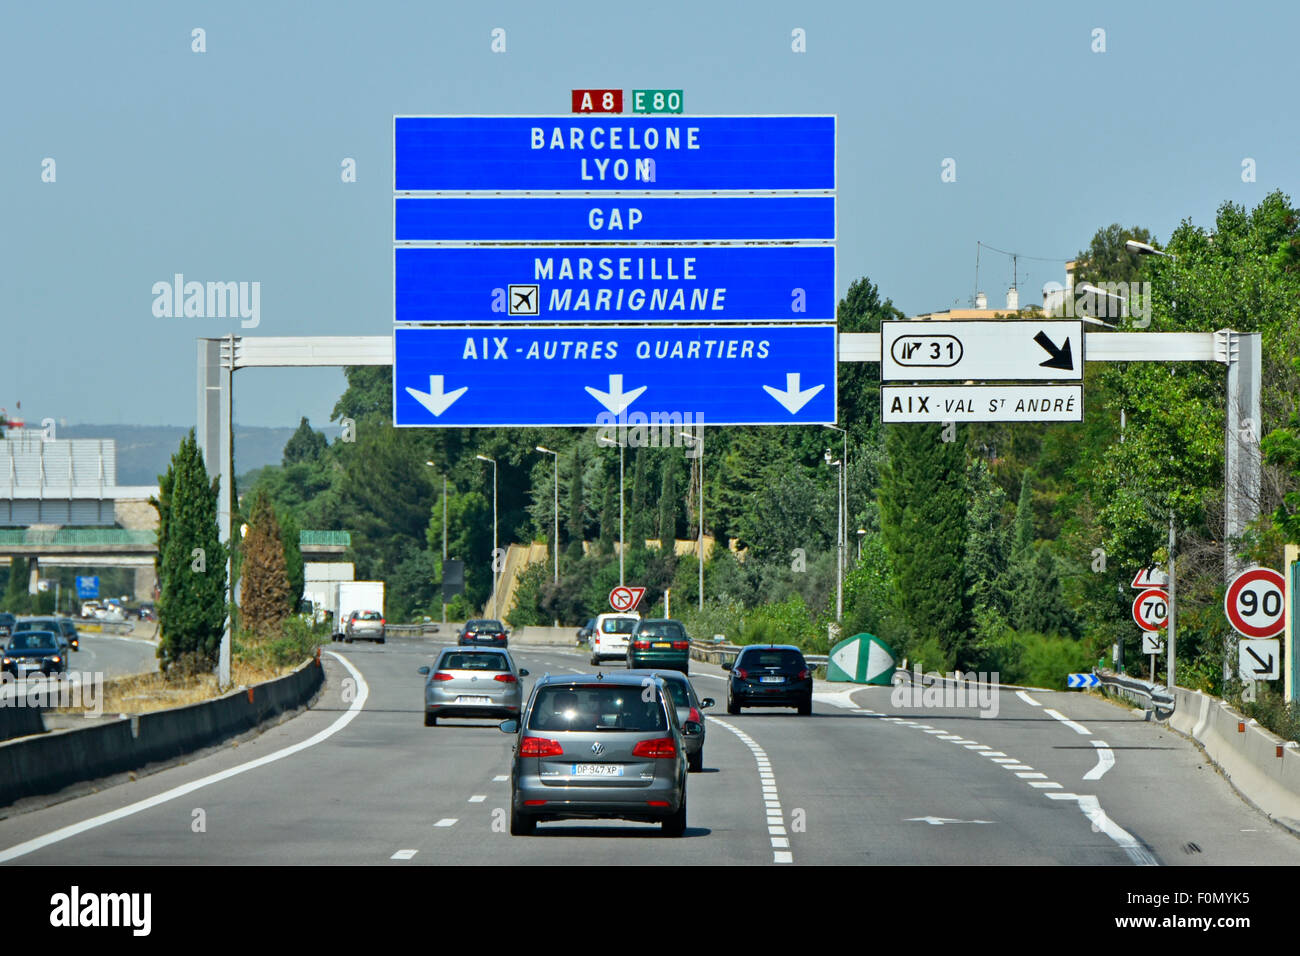 motorway gantry sign stock photos motorway gantry sign. Black Bedroom Furniture Sets. Home Design Ideas